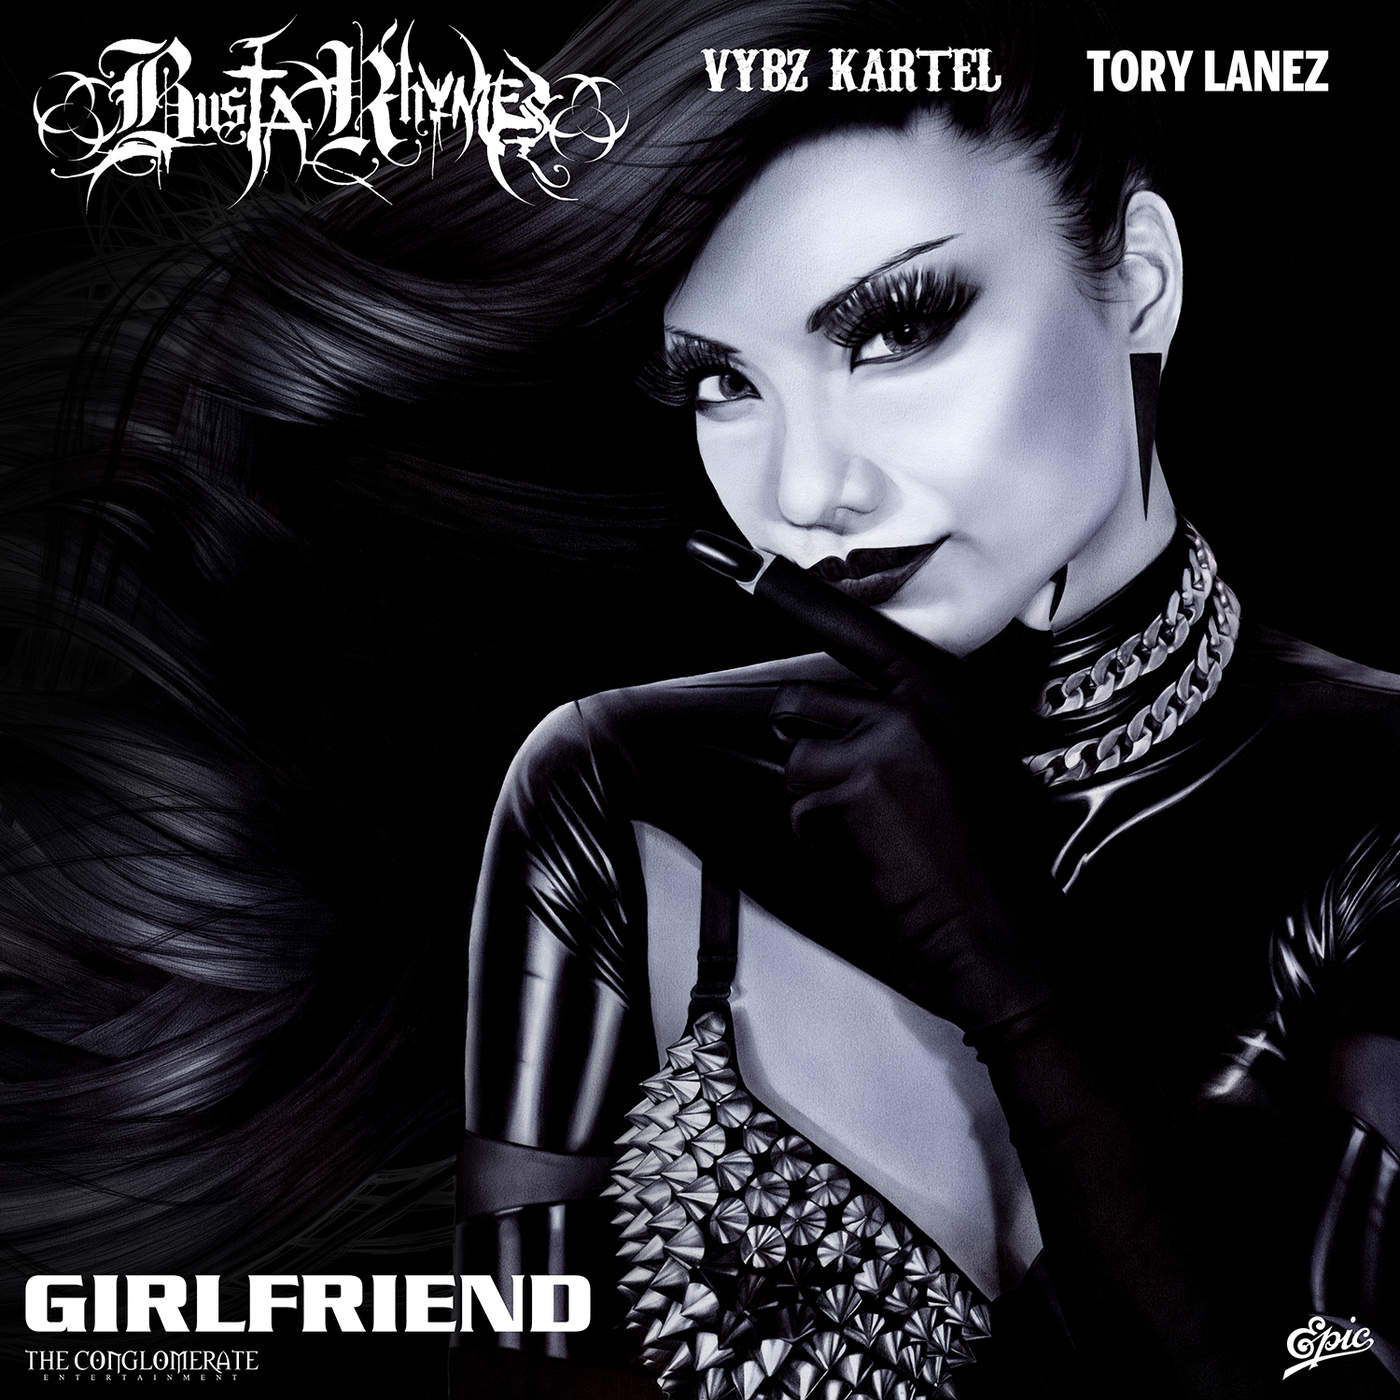 busta-rhymes-vybz kartel-tory lanez girlfriend